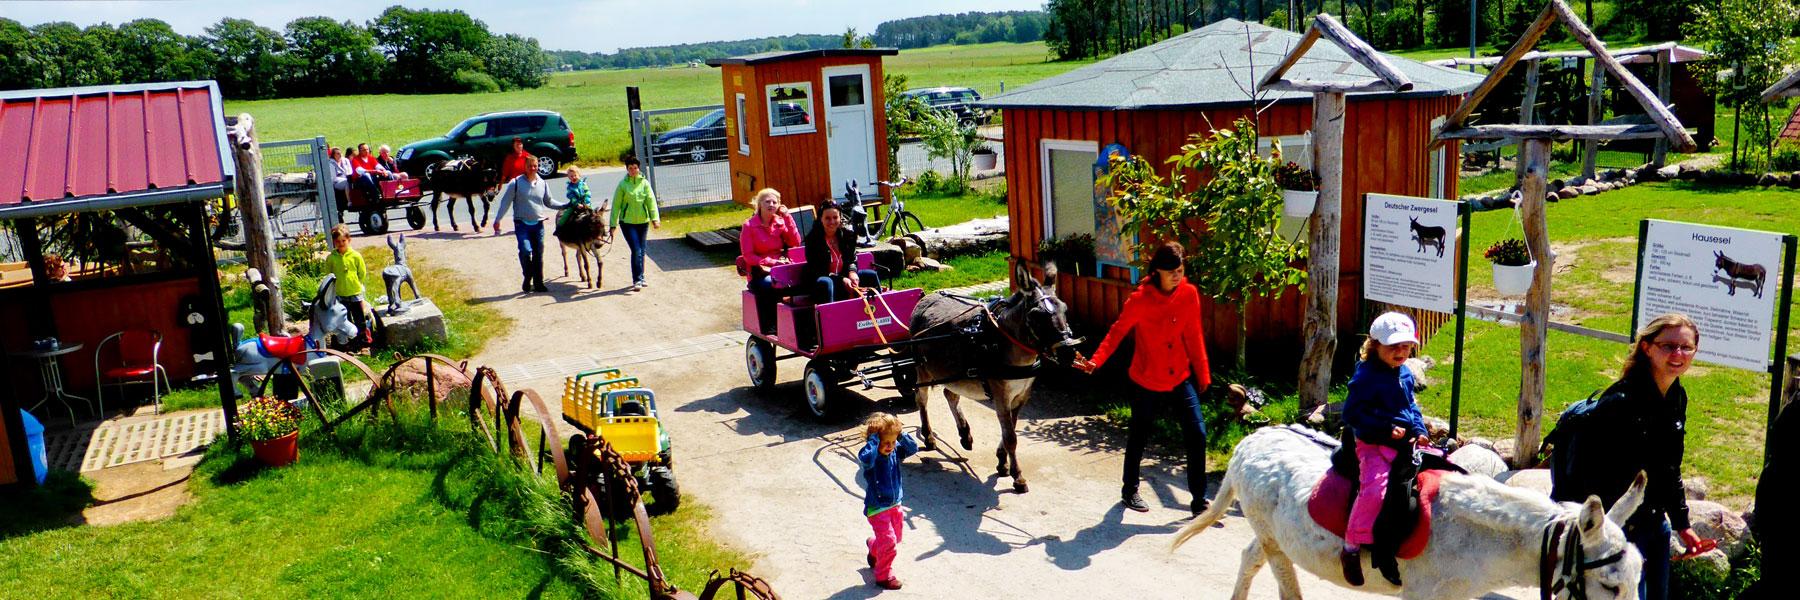 Wanderung - Eselhof I-AAH Klockenhagen